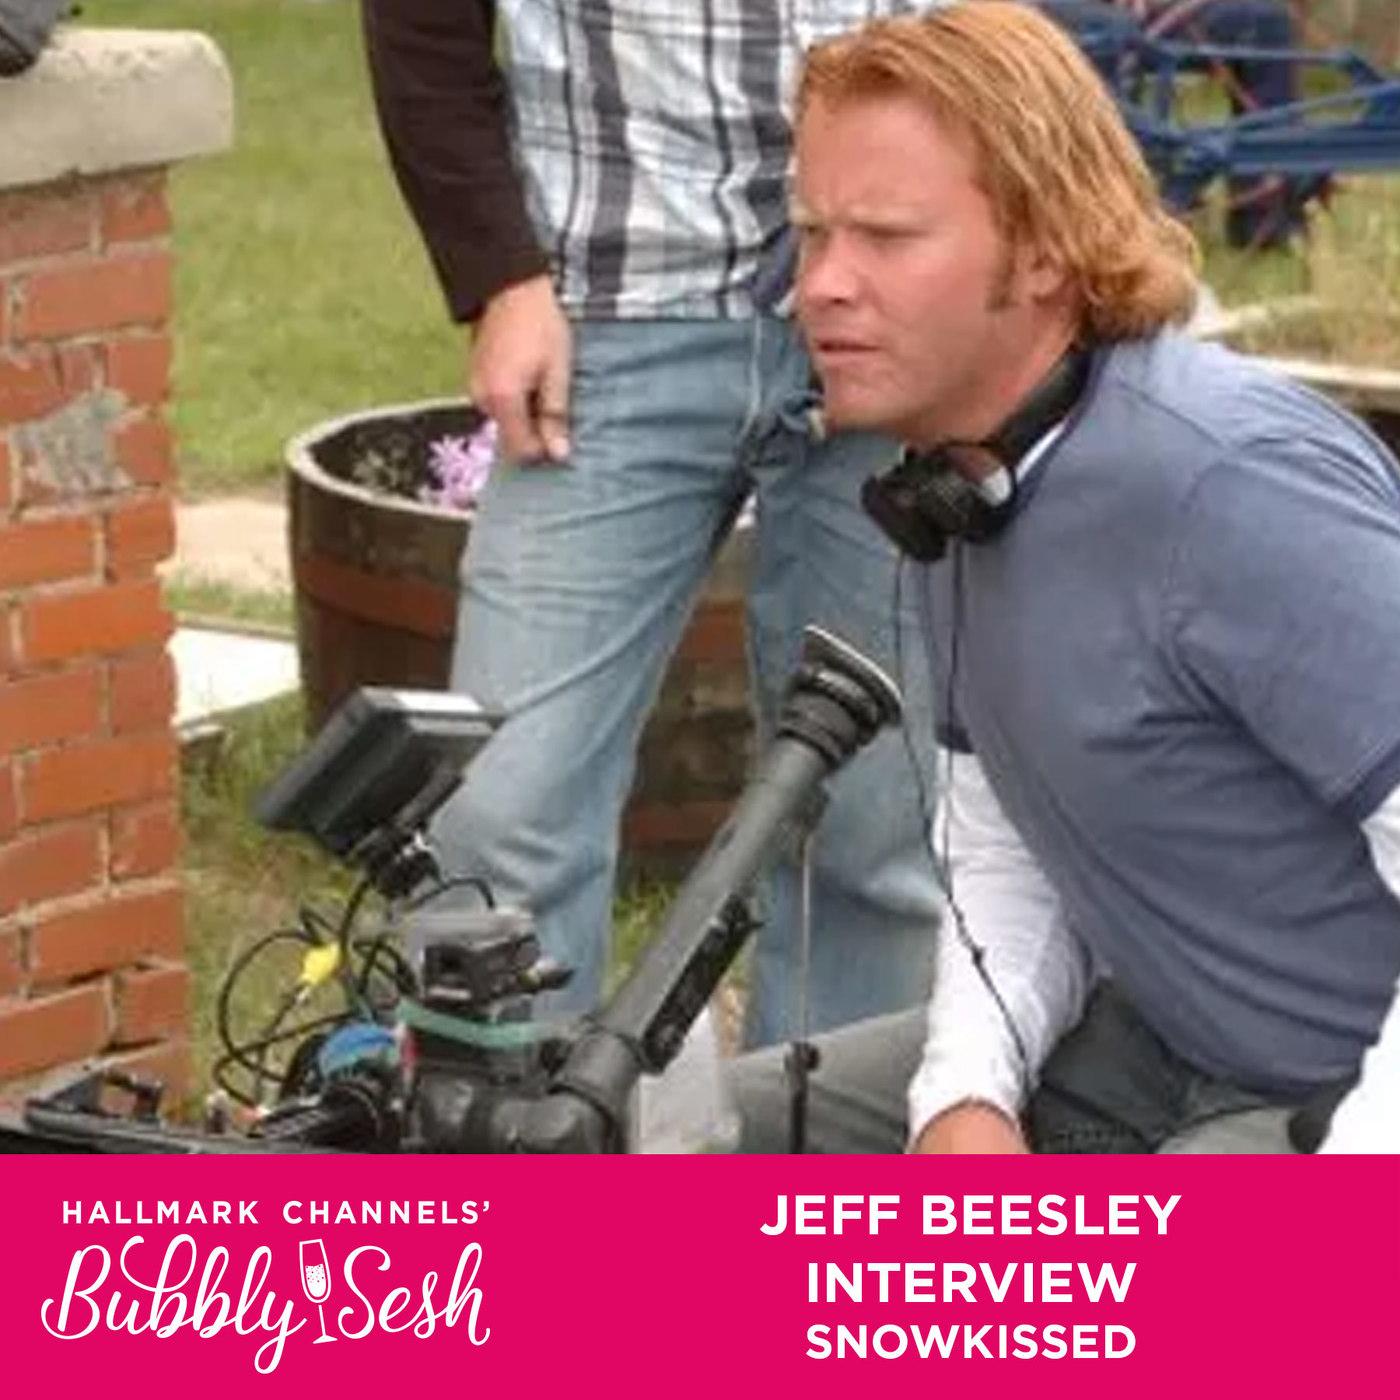 Jeff Beesley Interview